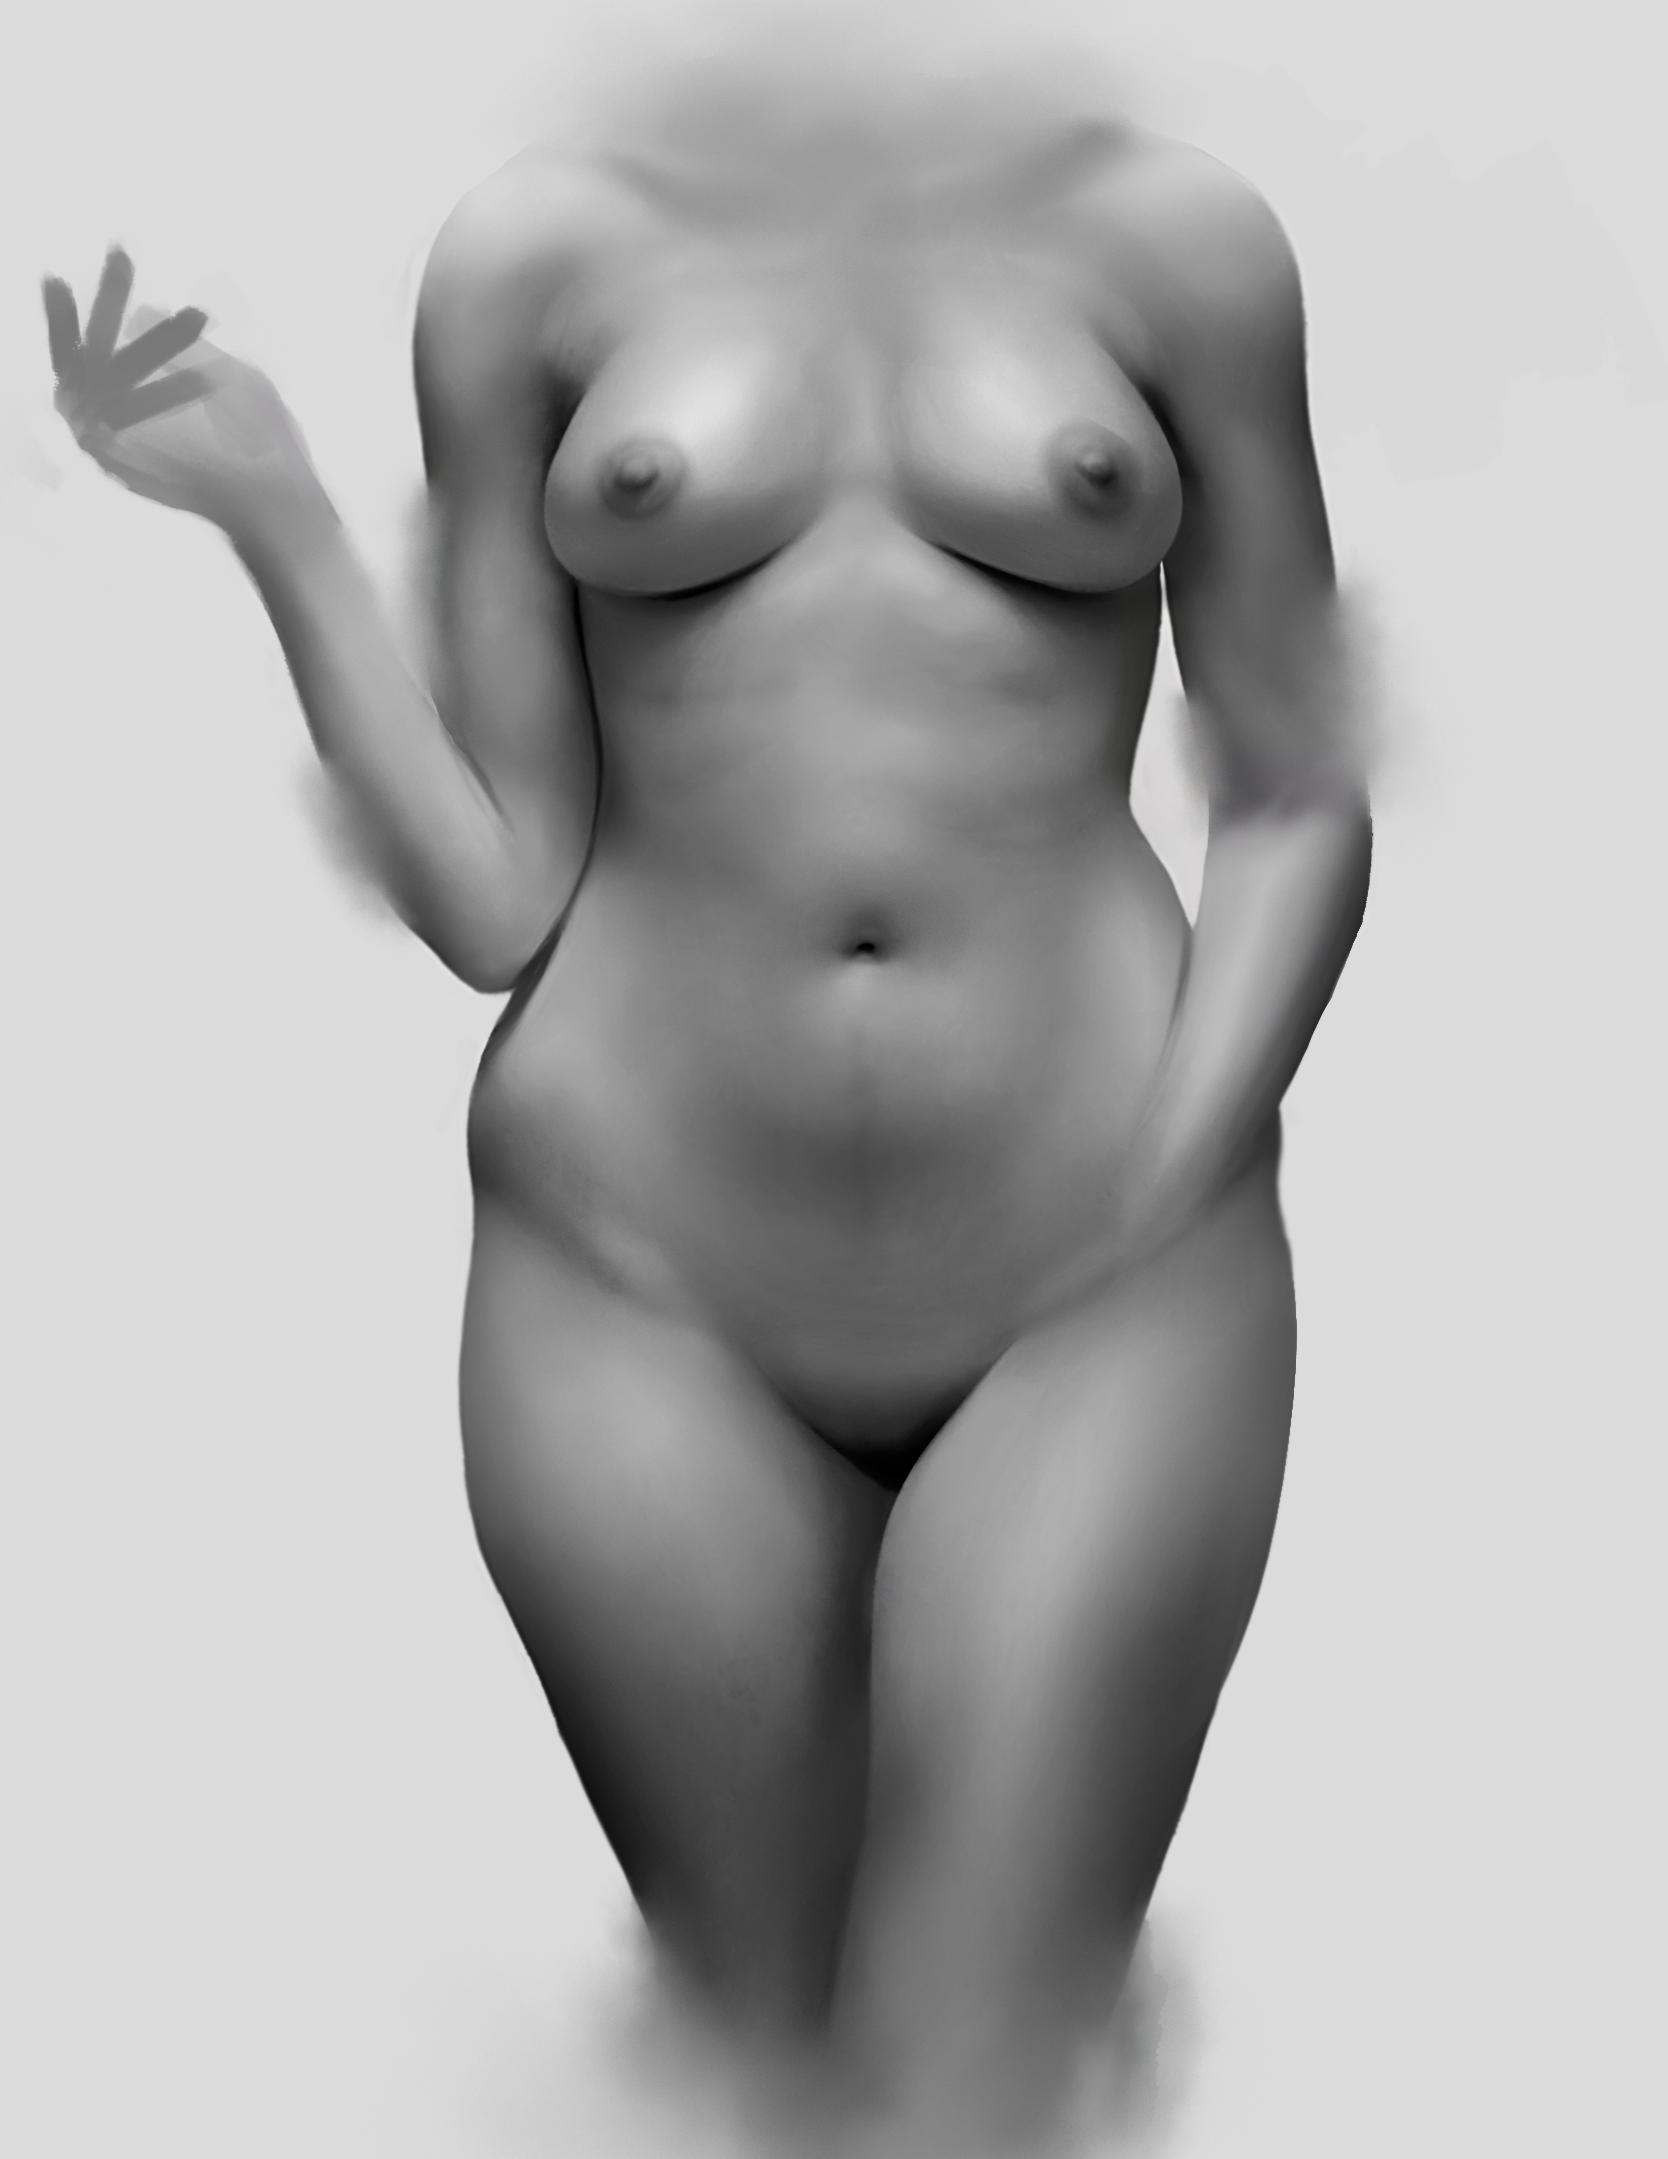 Nude Frontal Figure.jpg